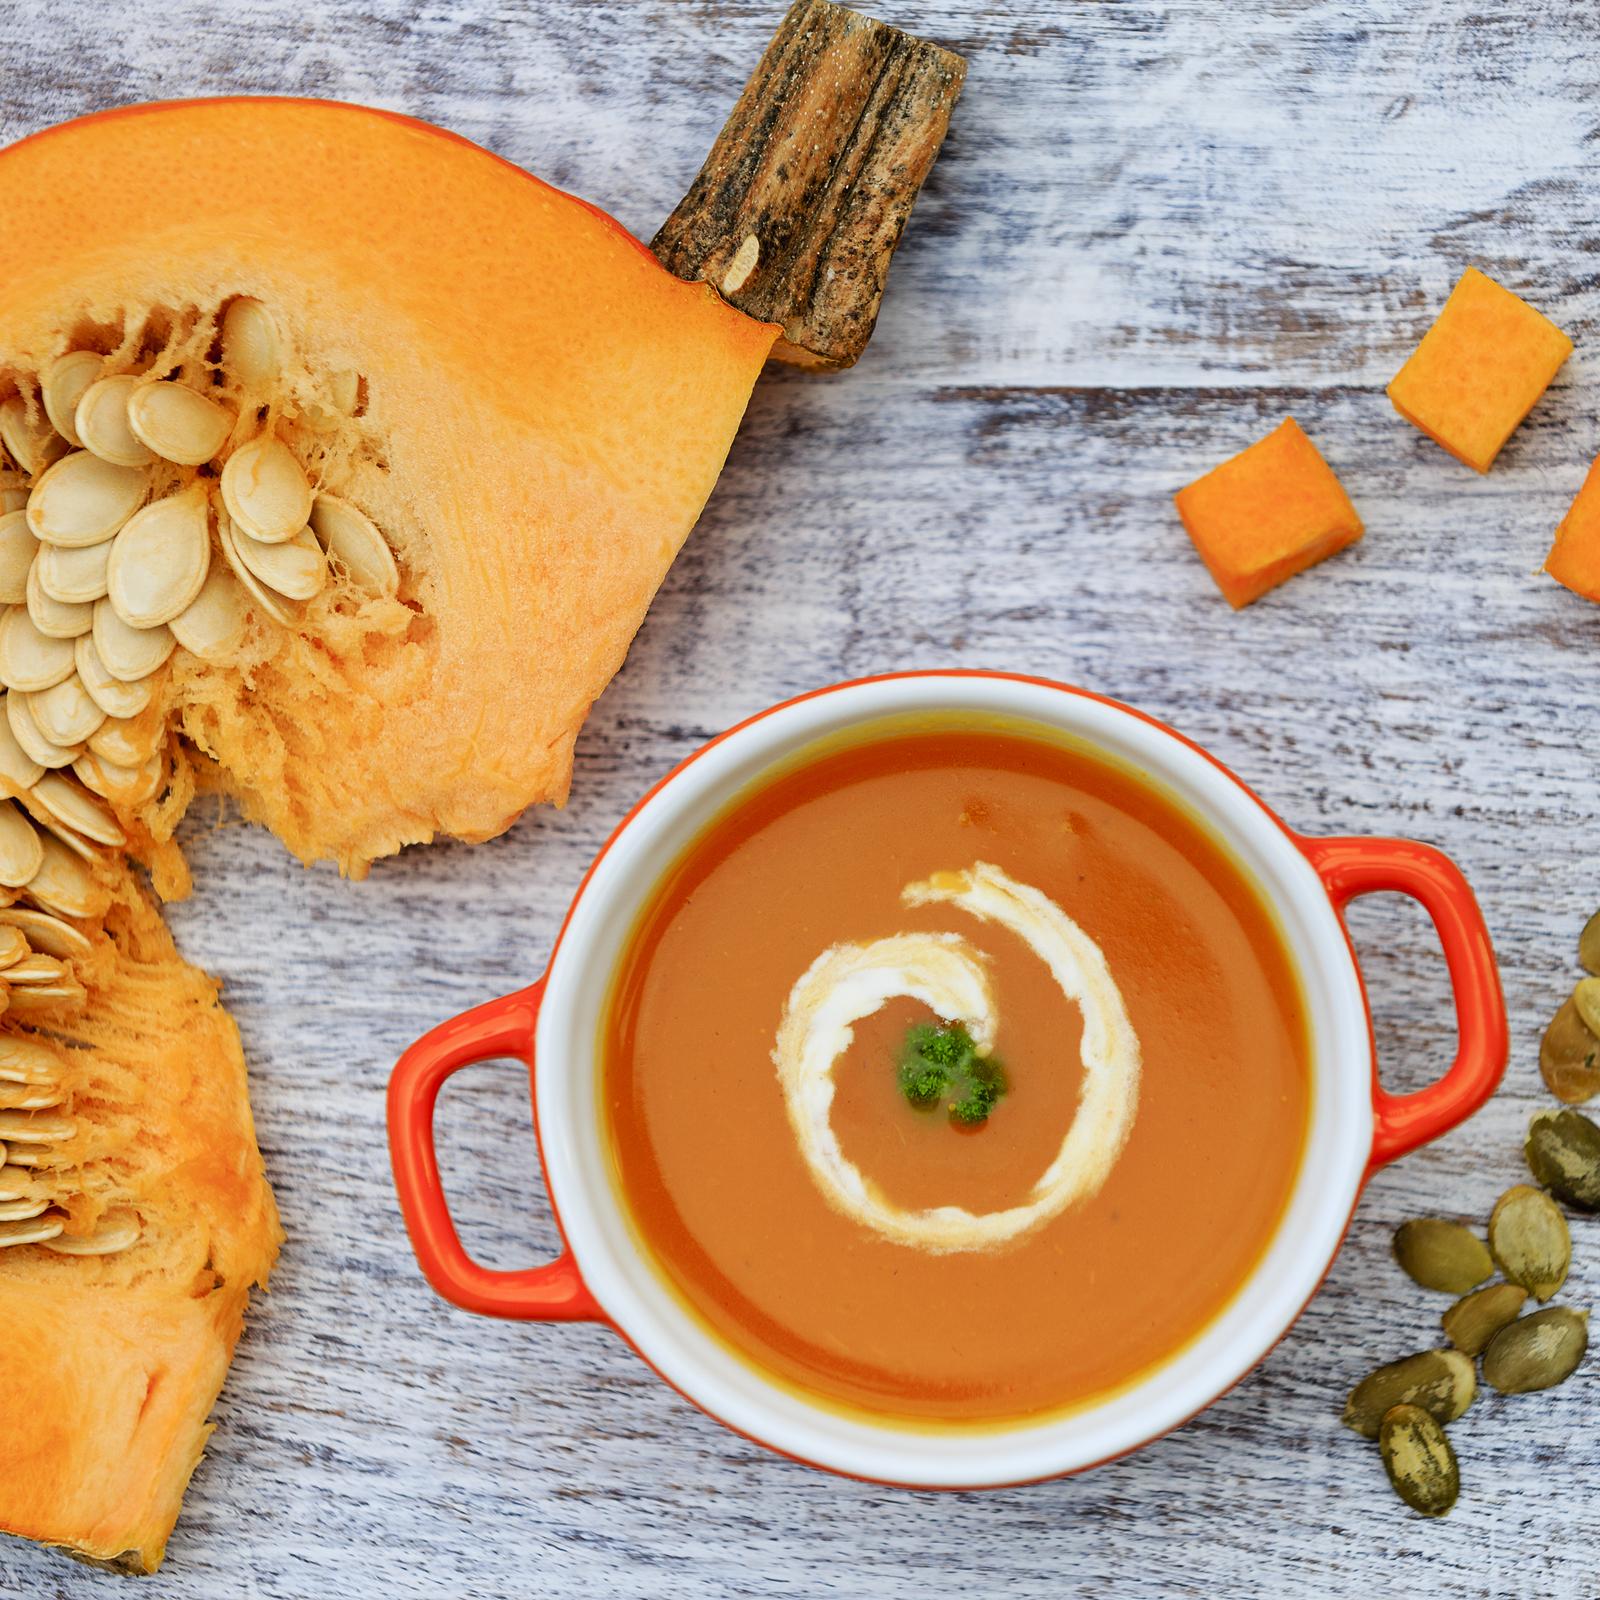 bigstock-Pumpkin-soup-Traditional-sea-54184982.jpg